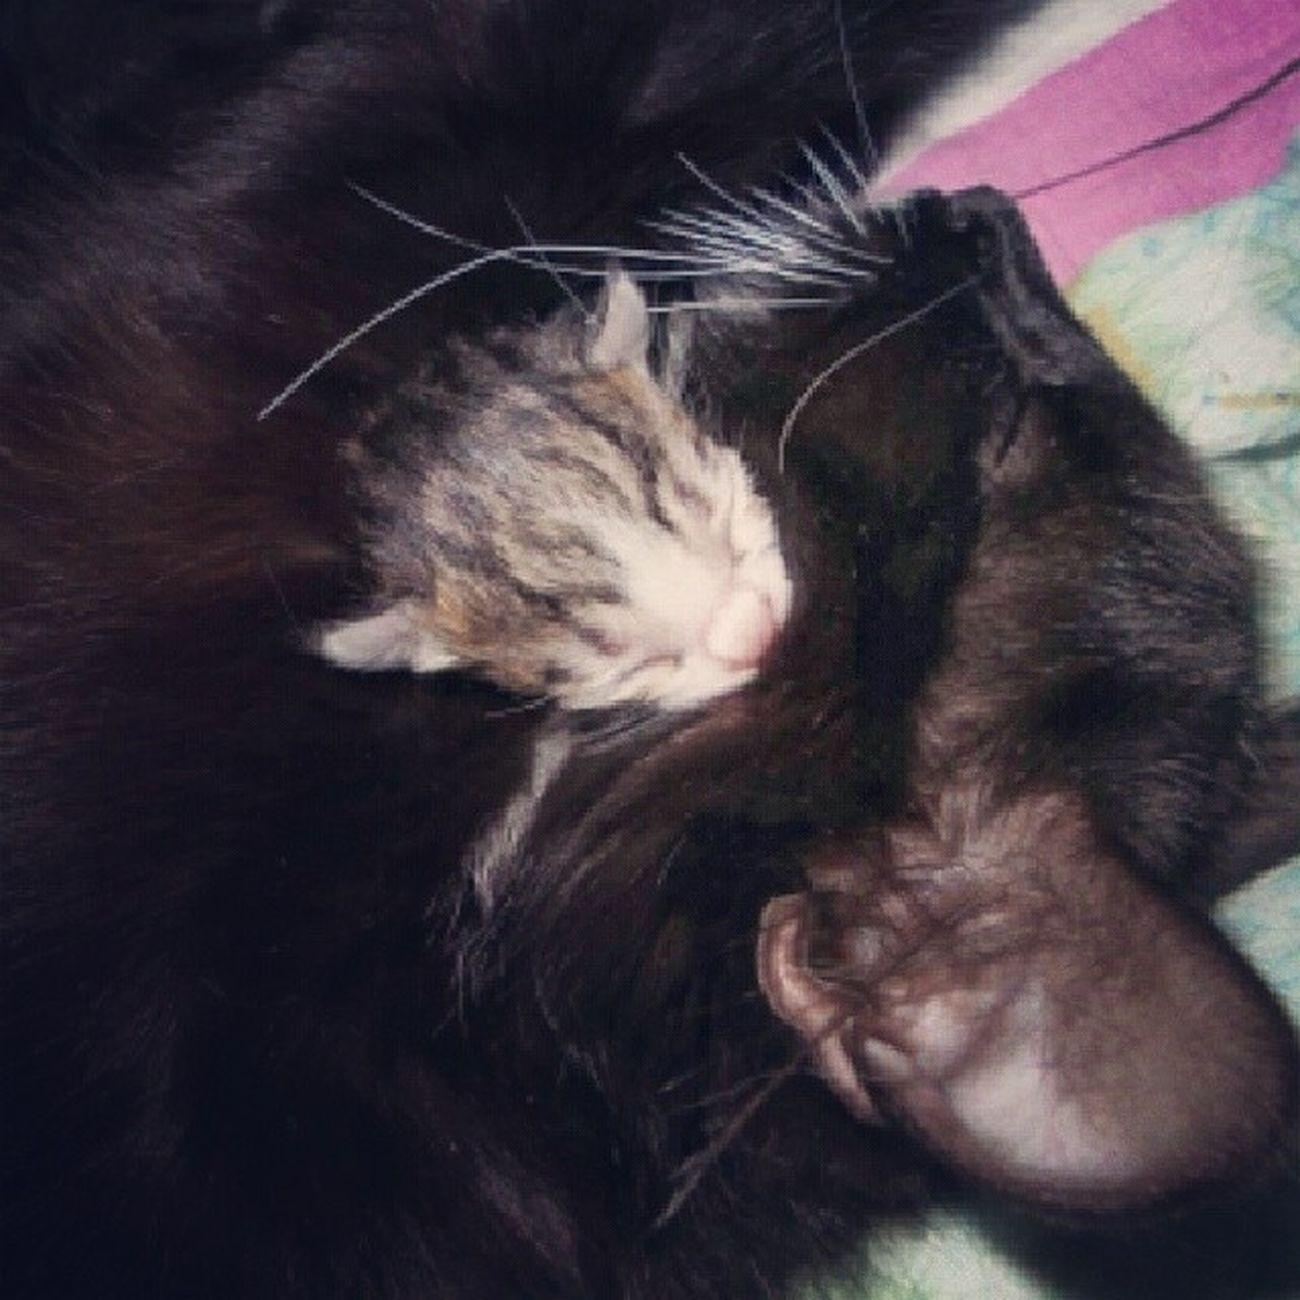 Anne Ogul Uykuda Kedi duman cat kittens belereisimbul